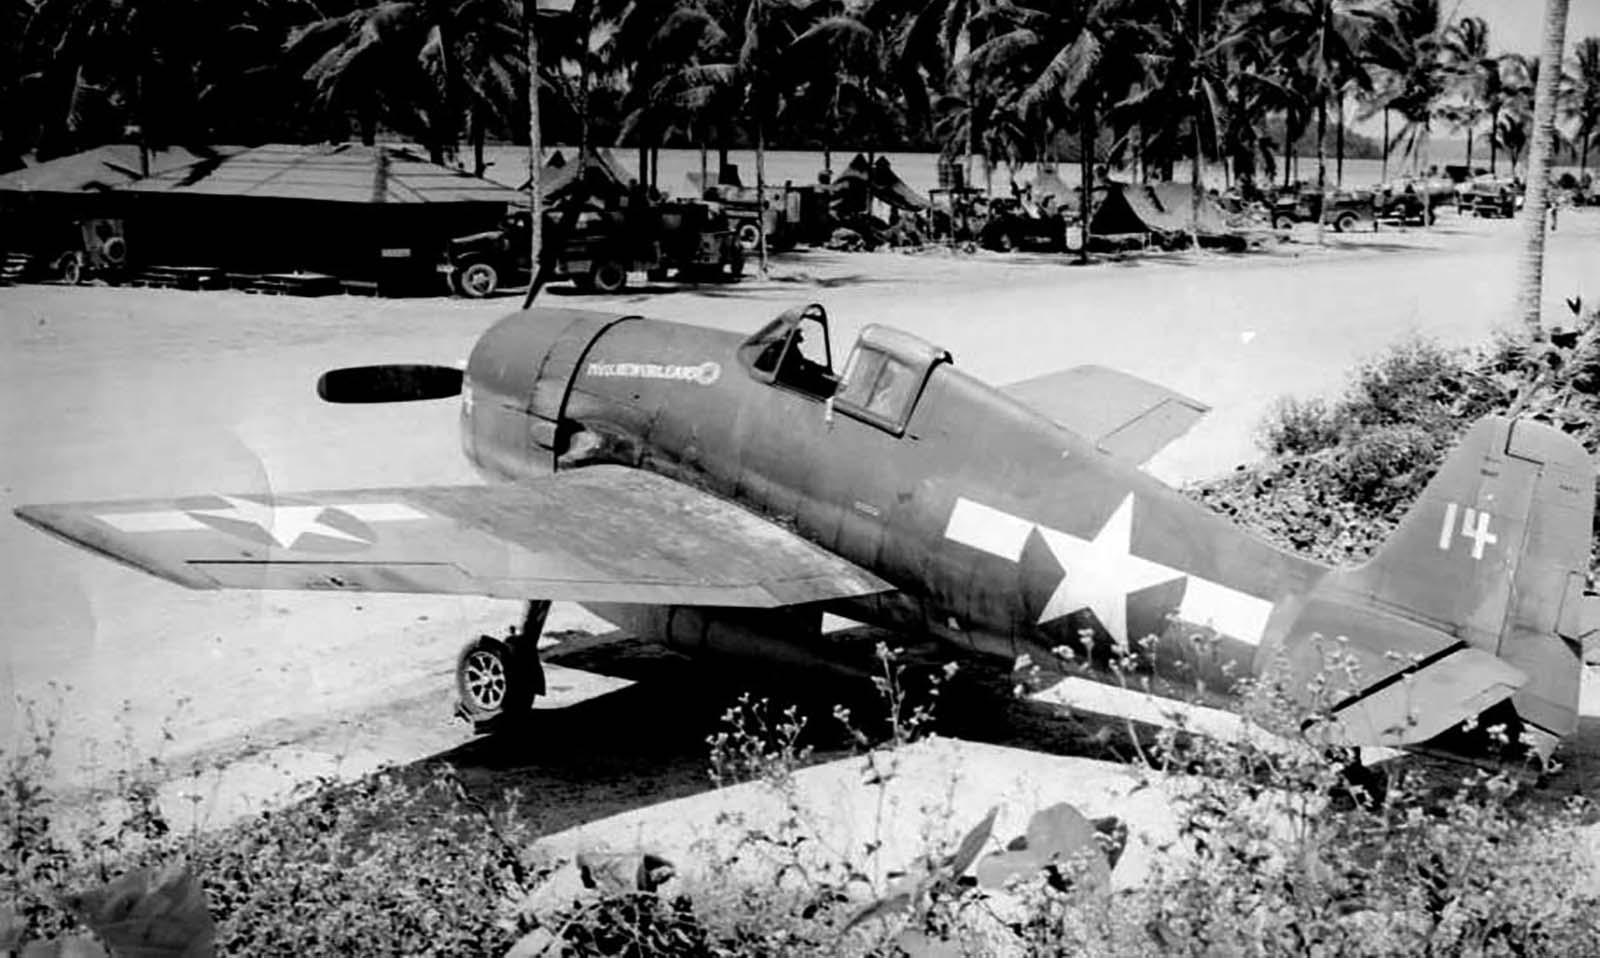 Grumman F6F 3P Hellcat VF 38 White 14 at Munda airfield New Georgia Sep 1943 01